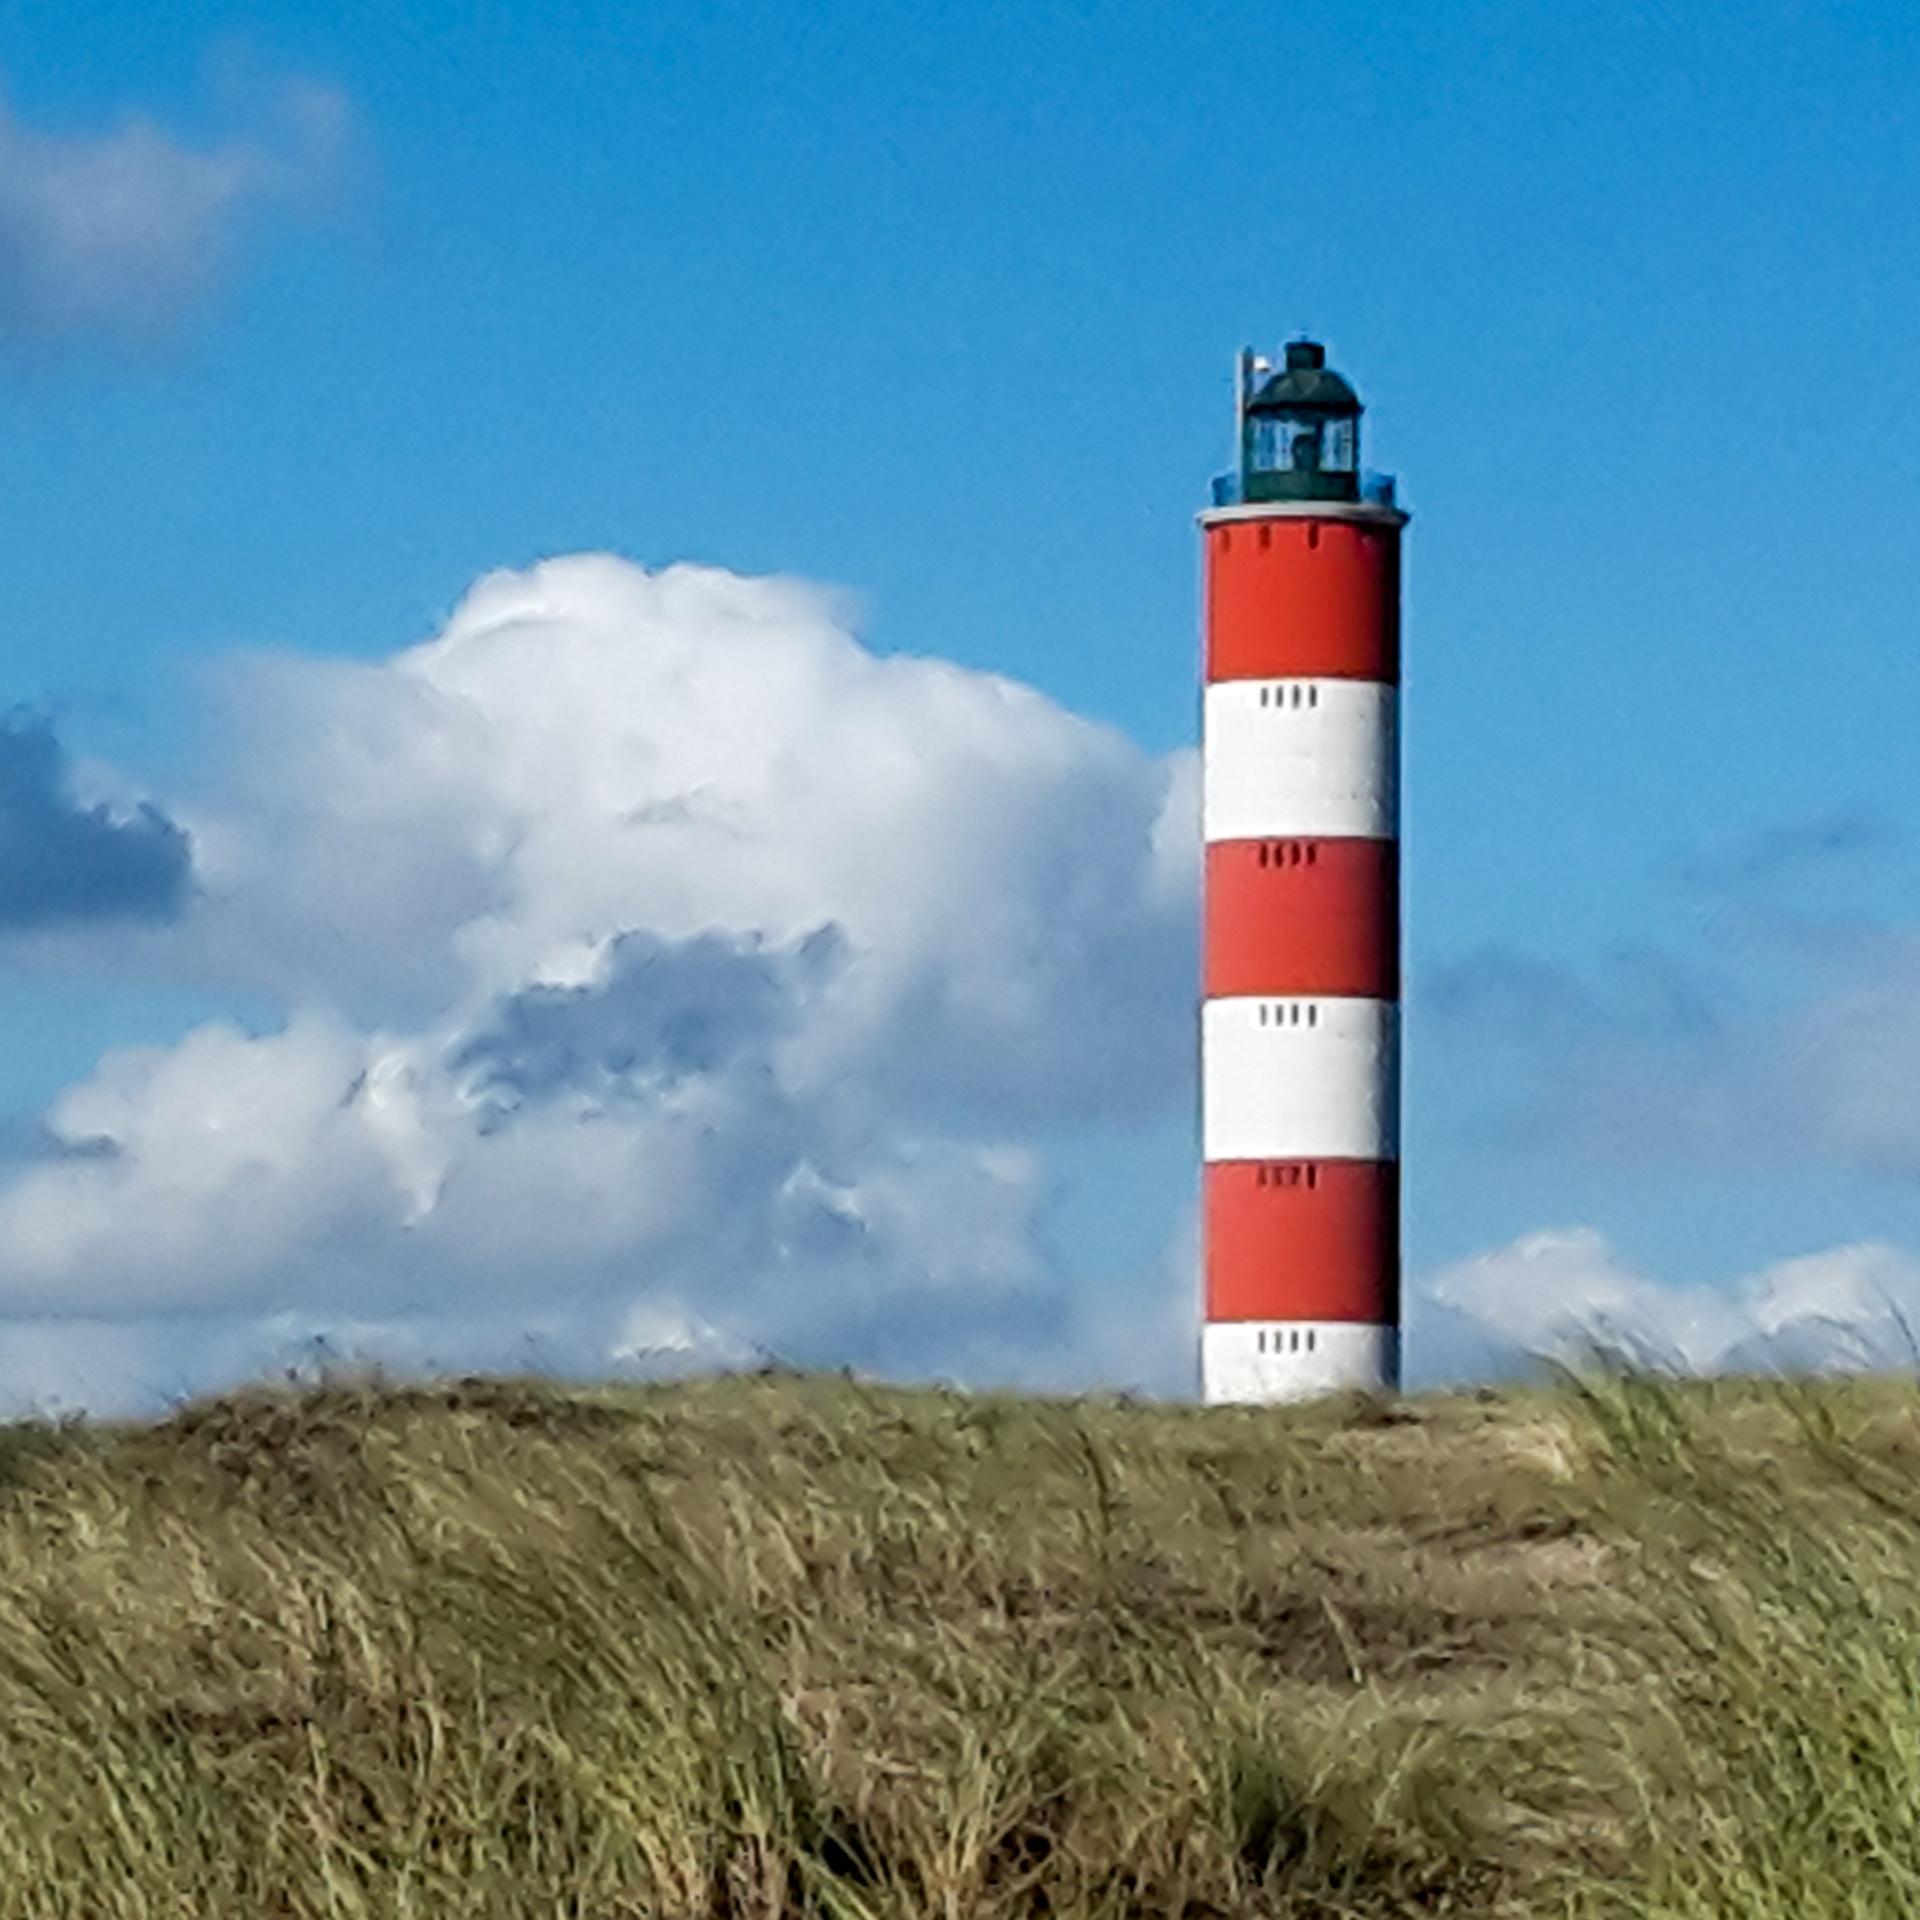 Le phare de Berck